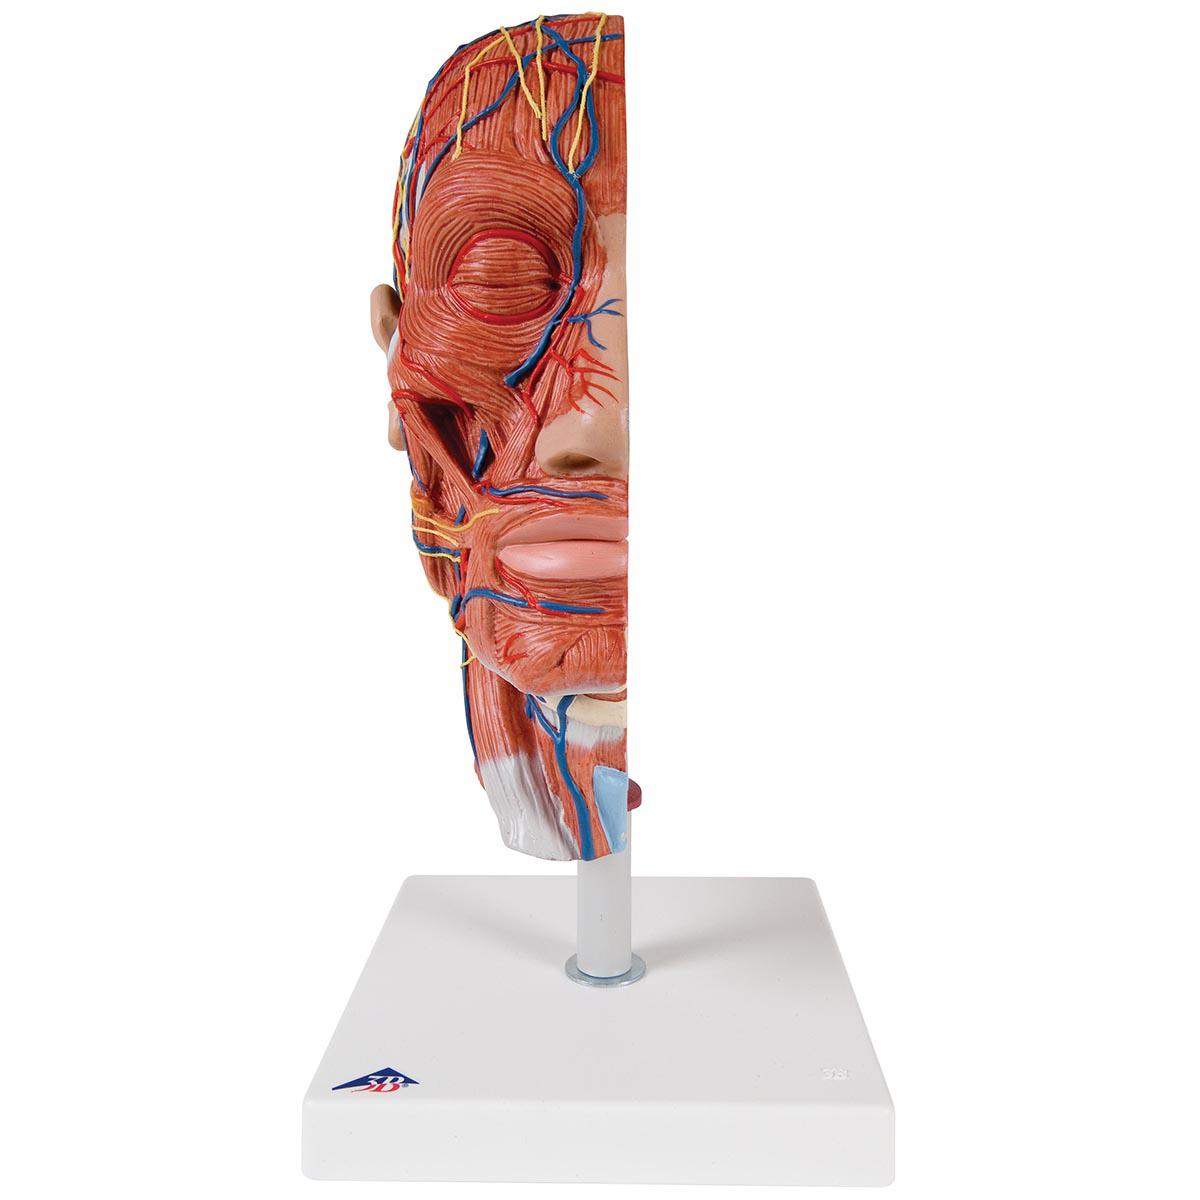 Anatomical Teaching Models | Plastic Anatomy Models | Half Head with ...